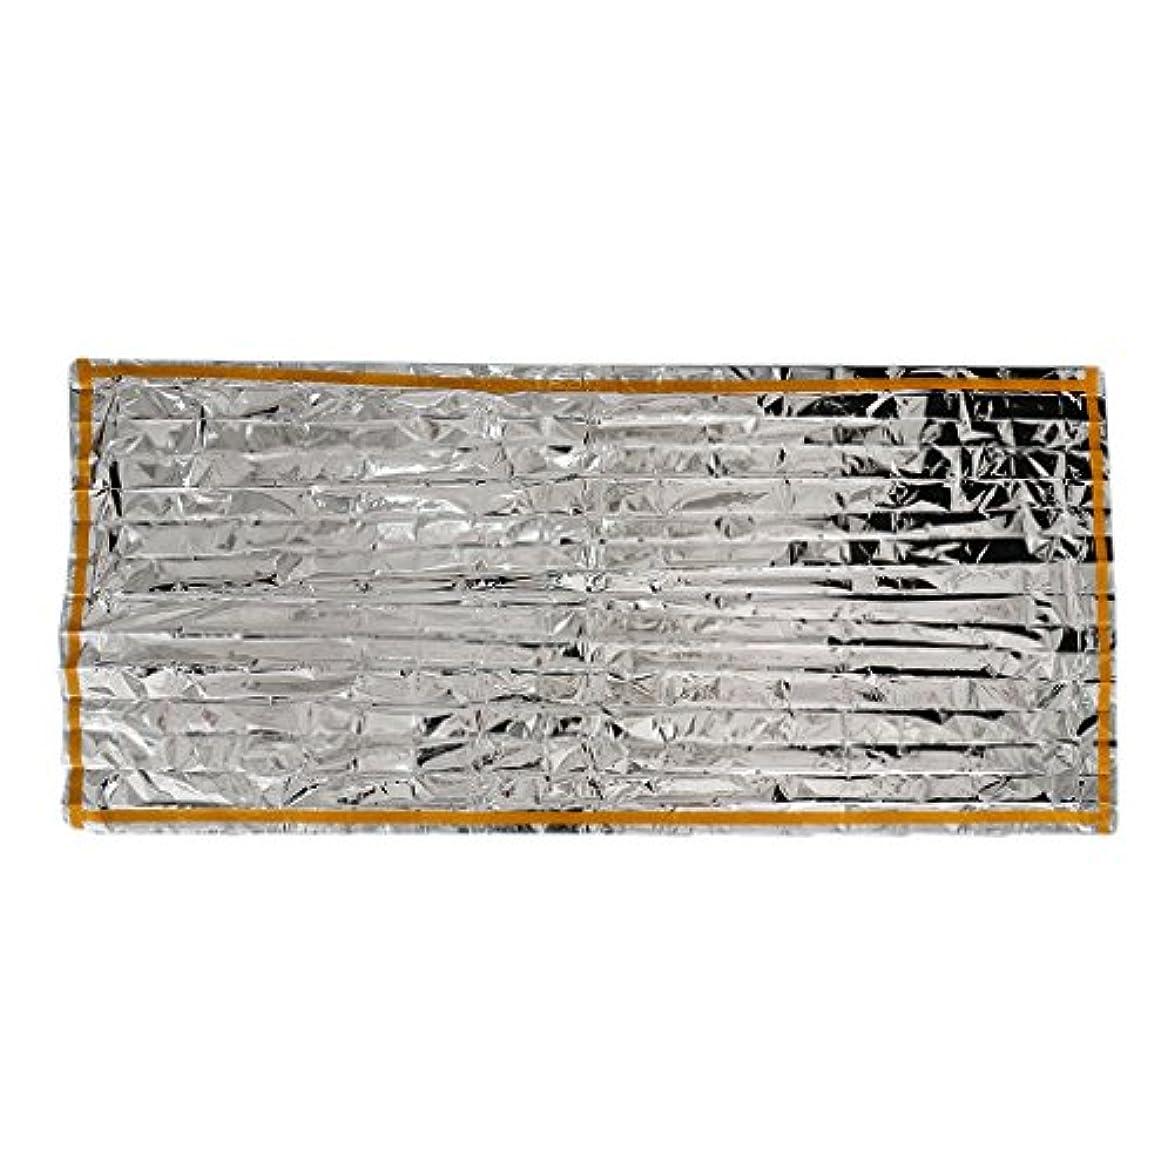 SunniMix アウトドア キャンプ 防災 防災用 寝袋 スリーピングバッグ シュラフ 防水 200X100 cm 便利性